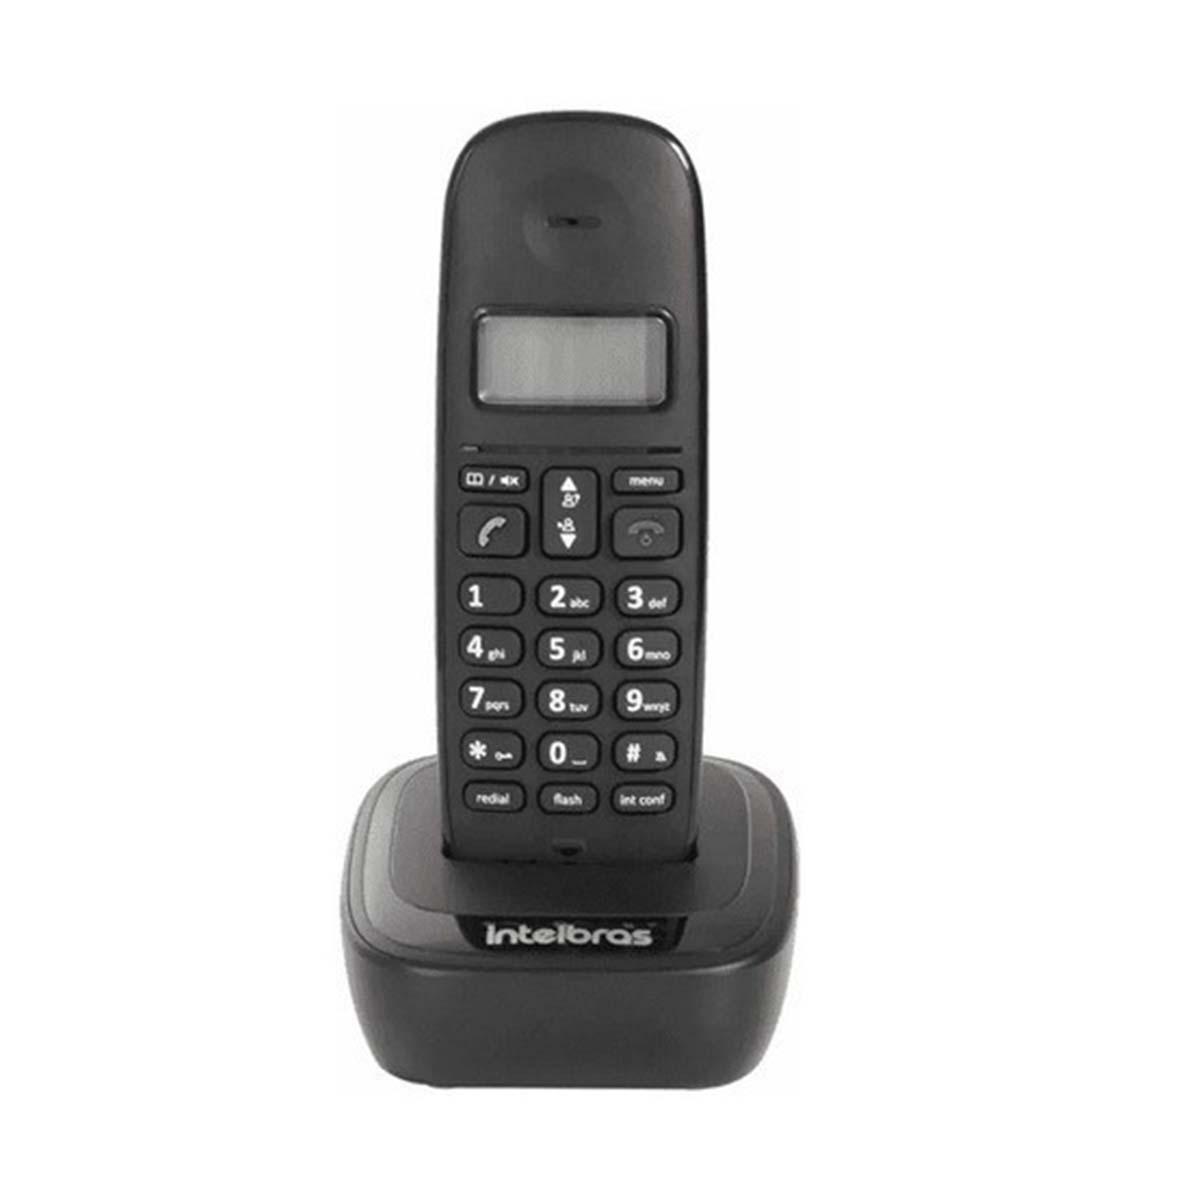 Kit 09 Telefone Sem Fio Intelbras Ts 2510 Preto